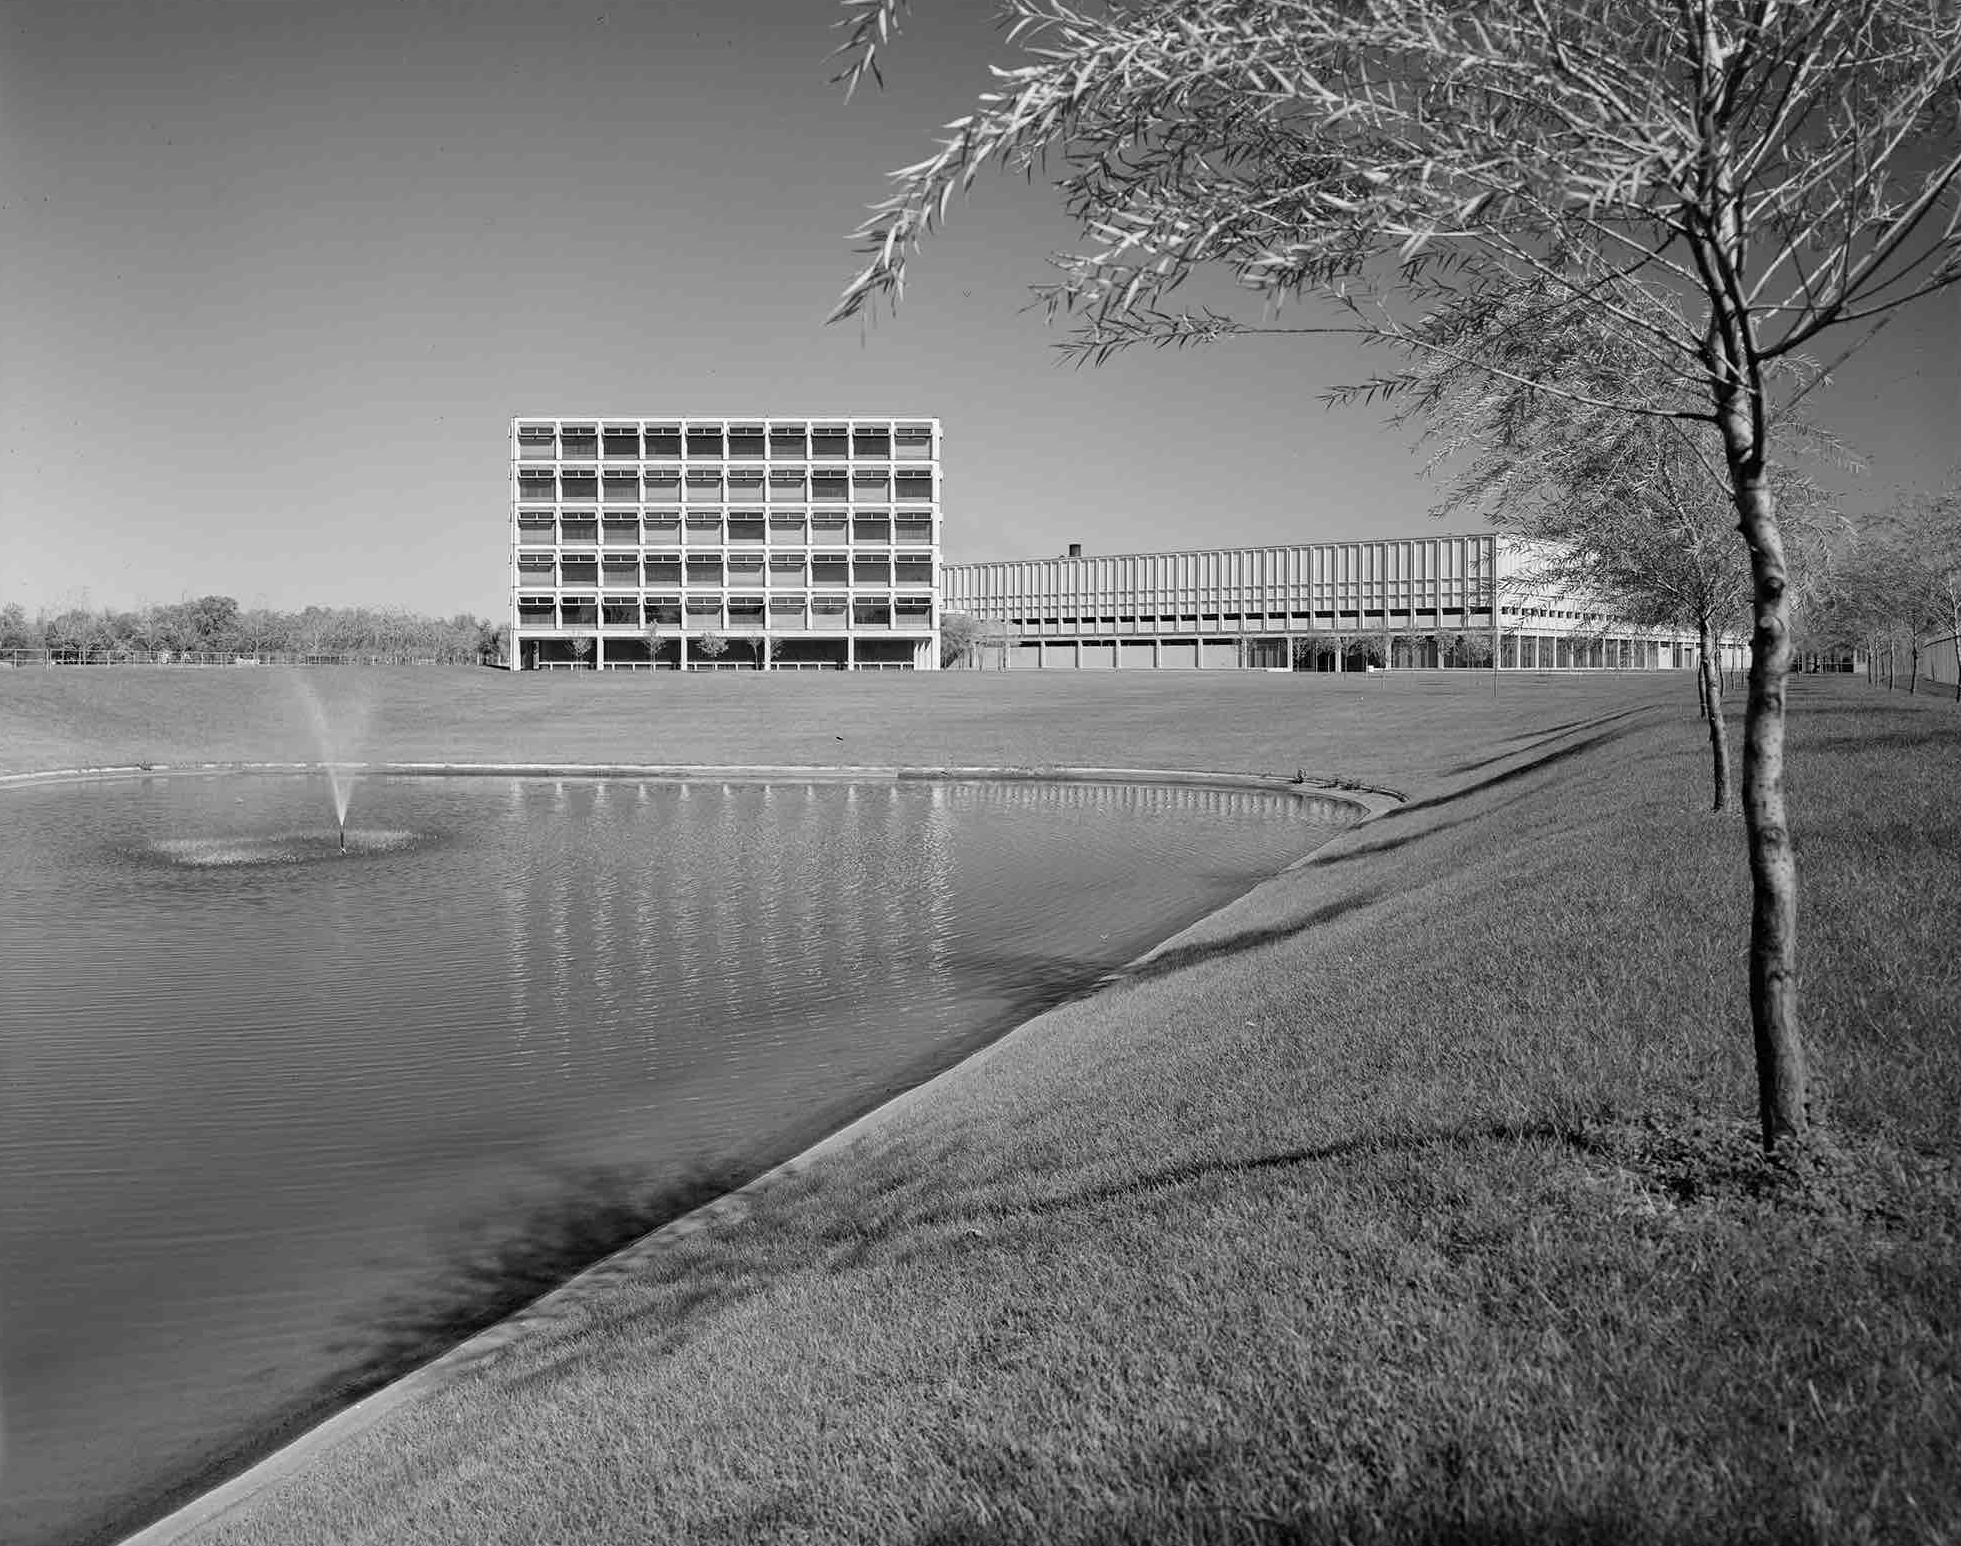 Harry Weese, Cummins Engine Company, Inc (Columbus, IN) 1961